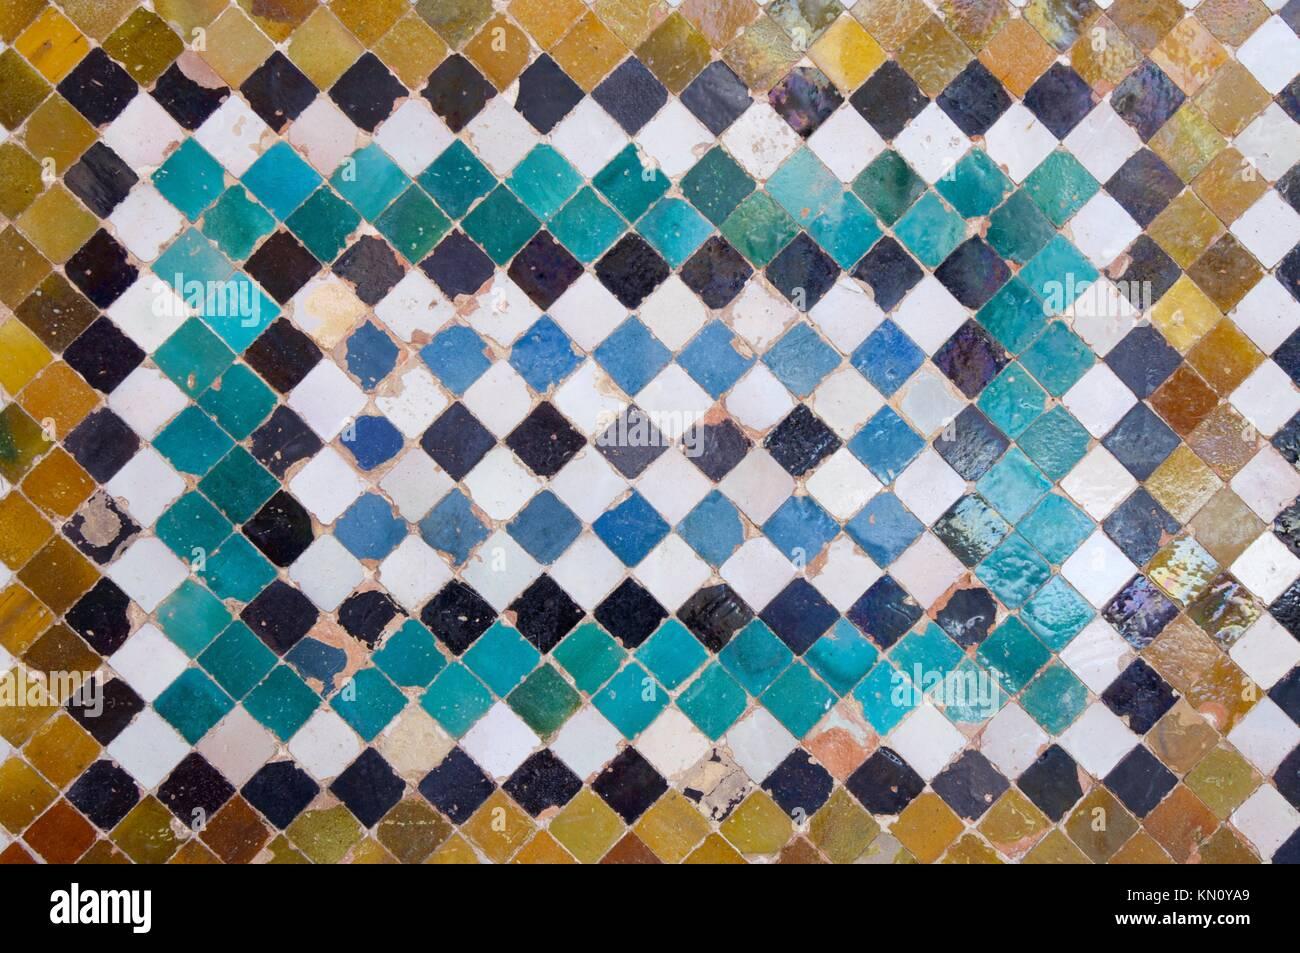 Tile Art Alhambra Palace Stock Photos & Tile Art Alhambra Palace ...